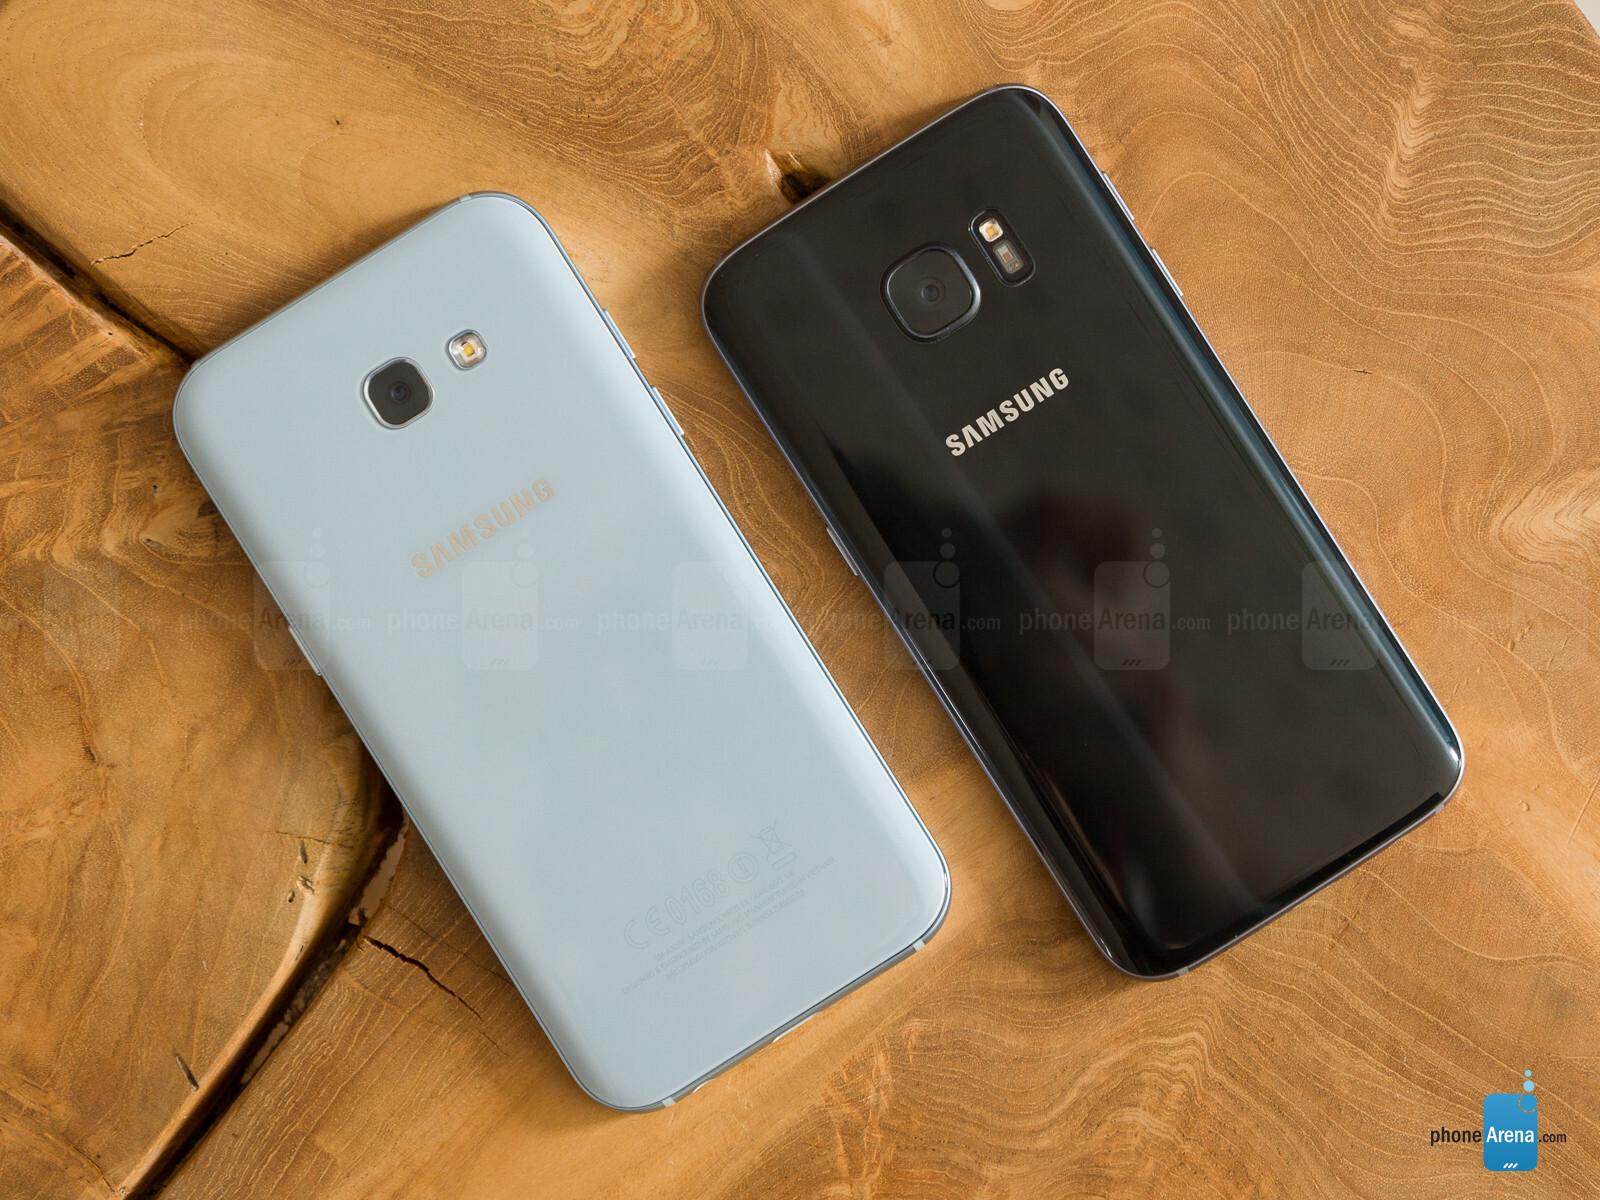 Samsung Galaxy A5 2017 Vs Samsung Galaxy S7